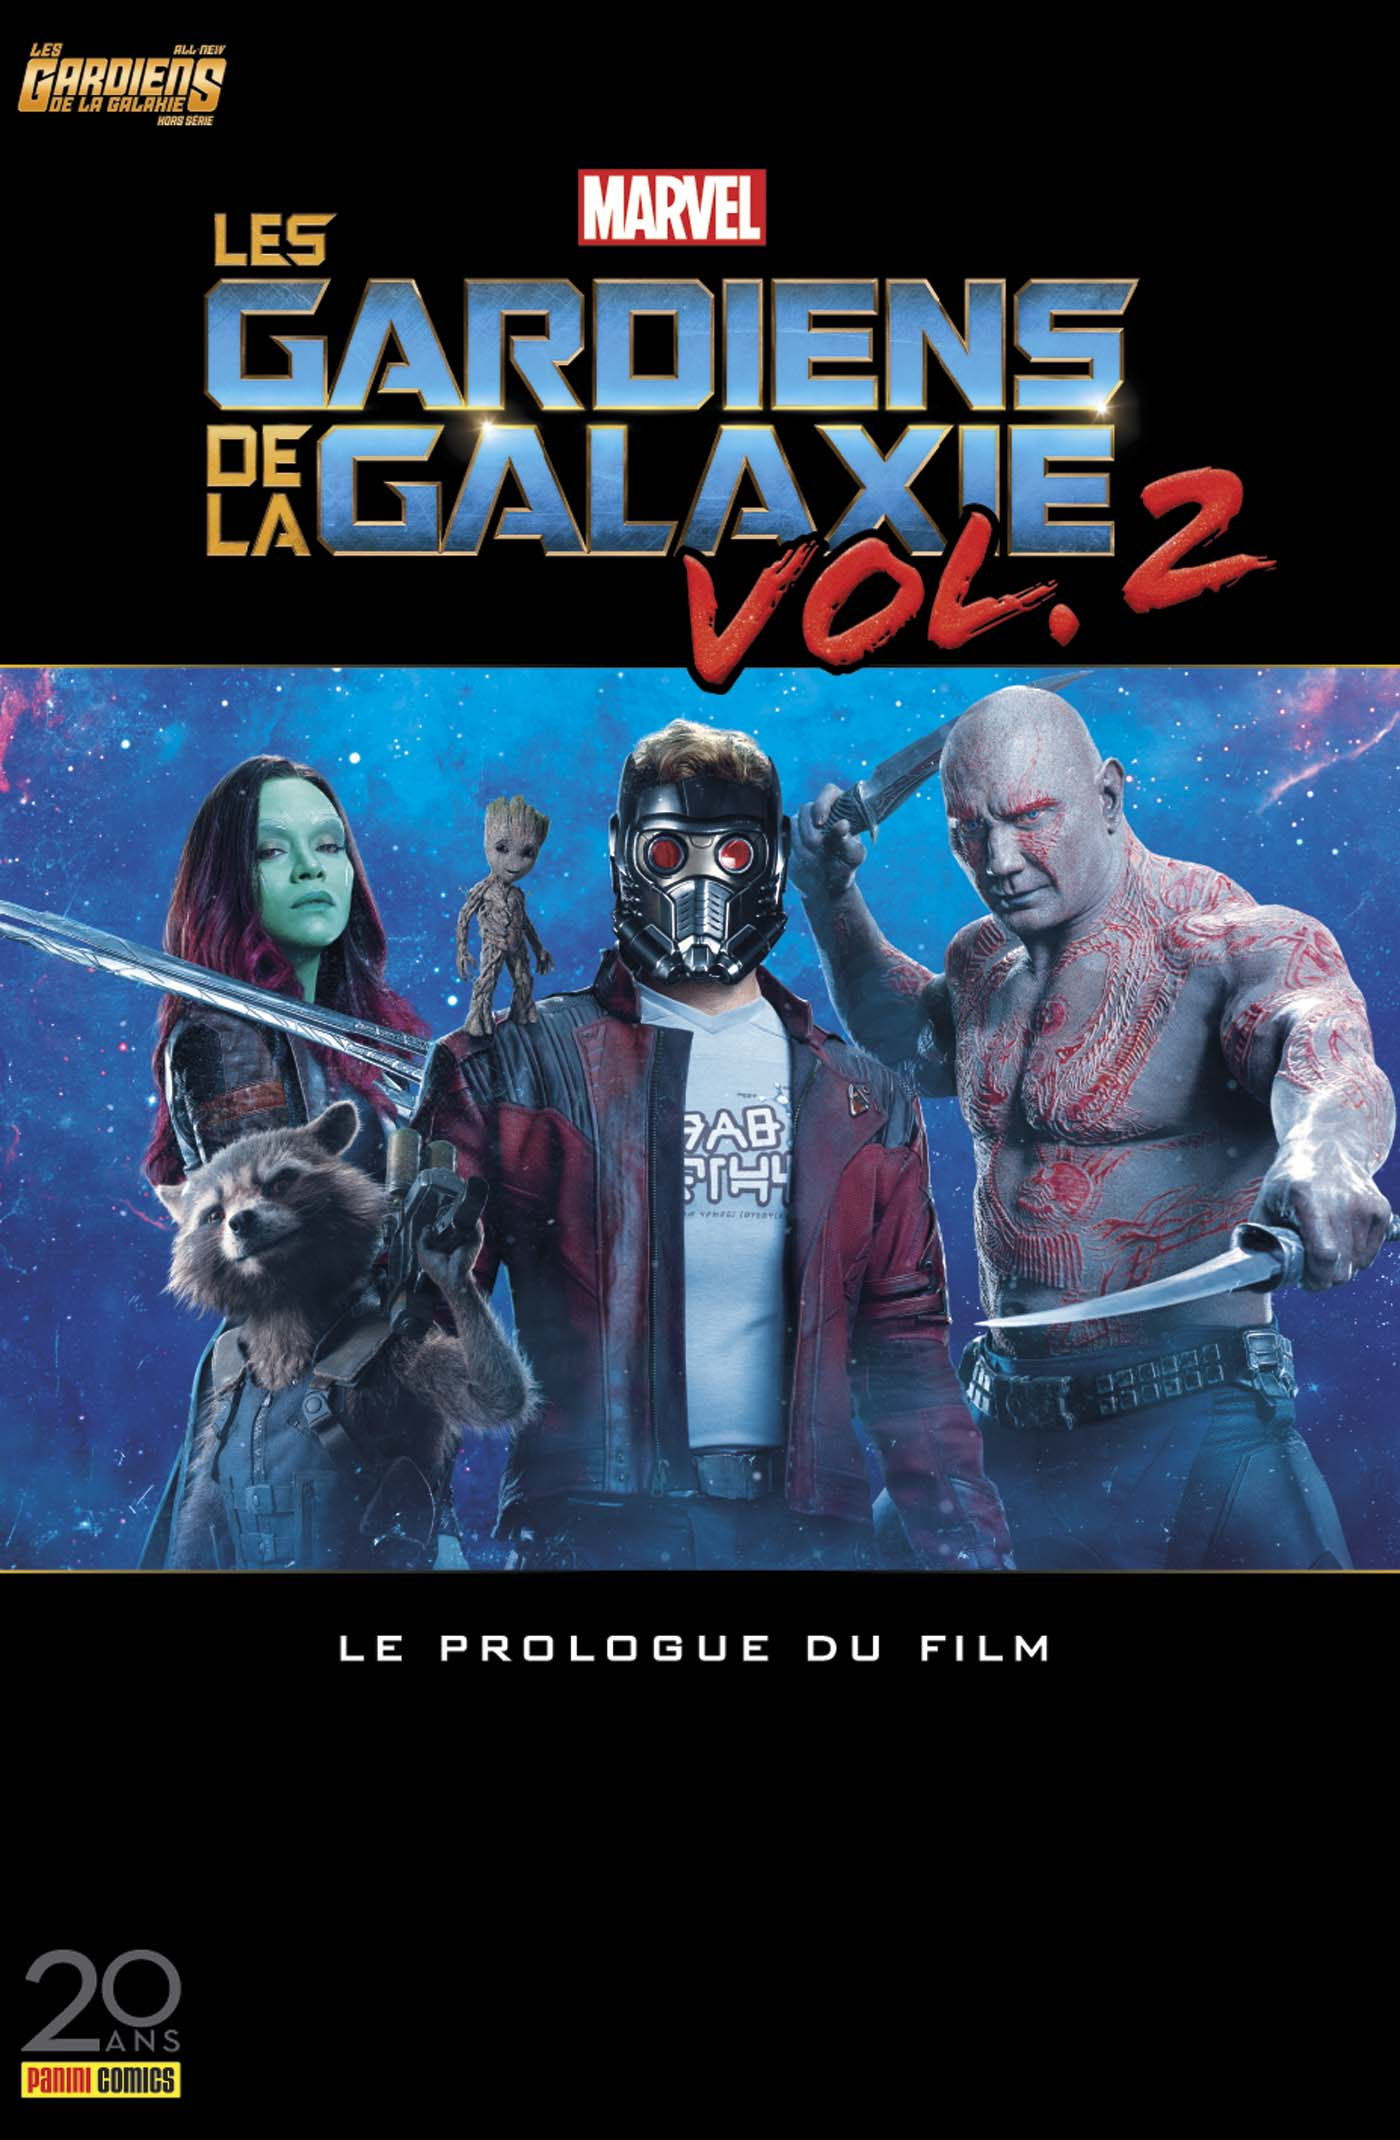 ALL-NEW LES GARDIENS DE LA GALAXIE HORS SERIE 4 : LES GARDIENS DE LA GALAXIE VOL. 2 (PROLOGUE)